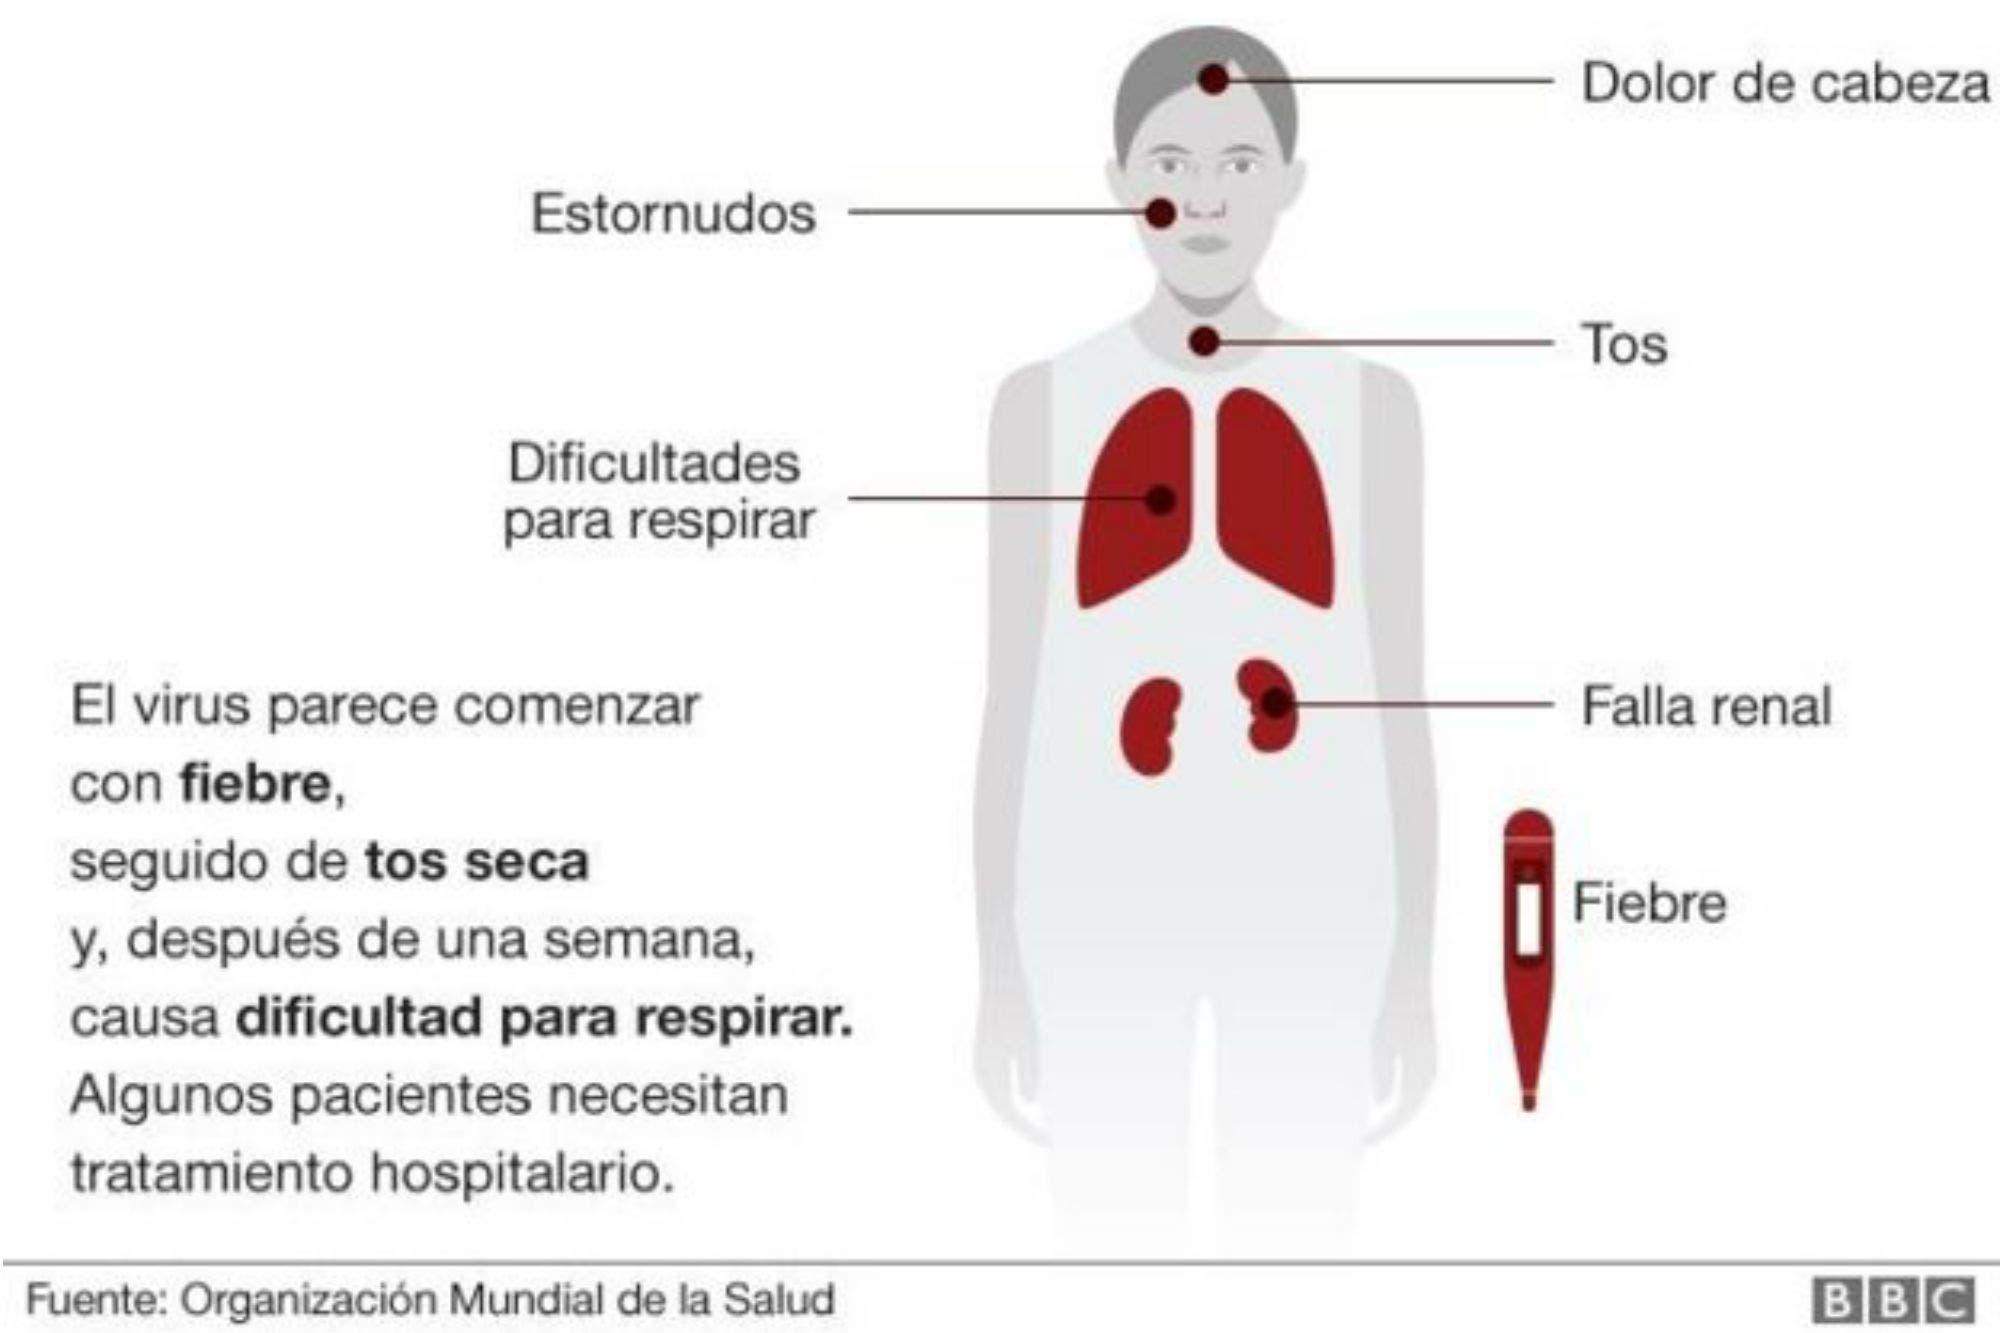 Coronavirus en Brasil: qué se sabe del primer caso confirmado en América Latina